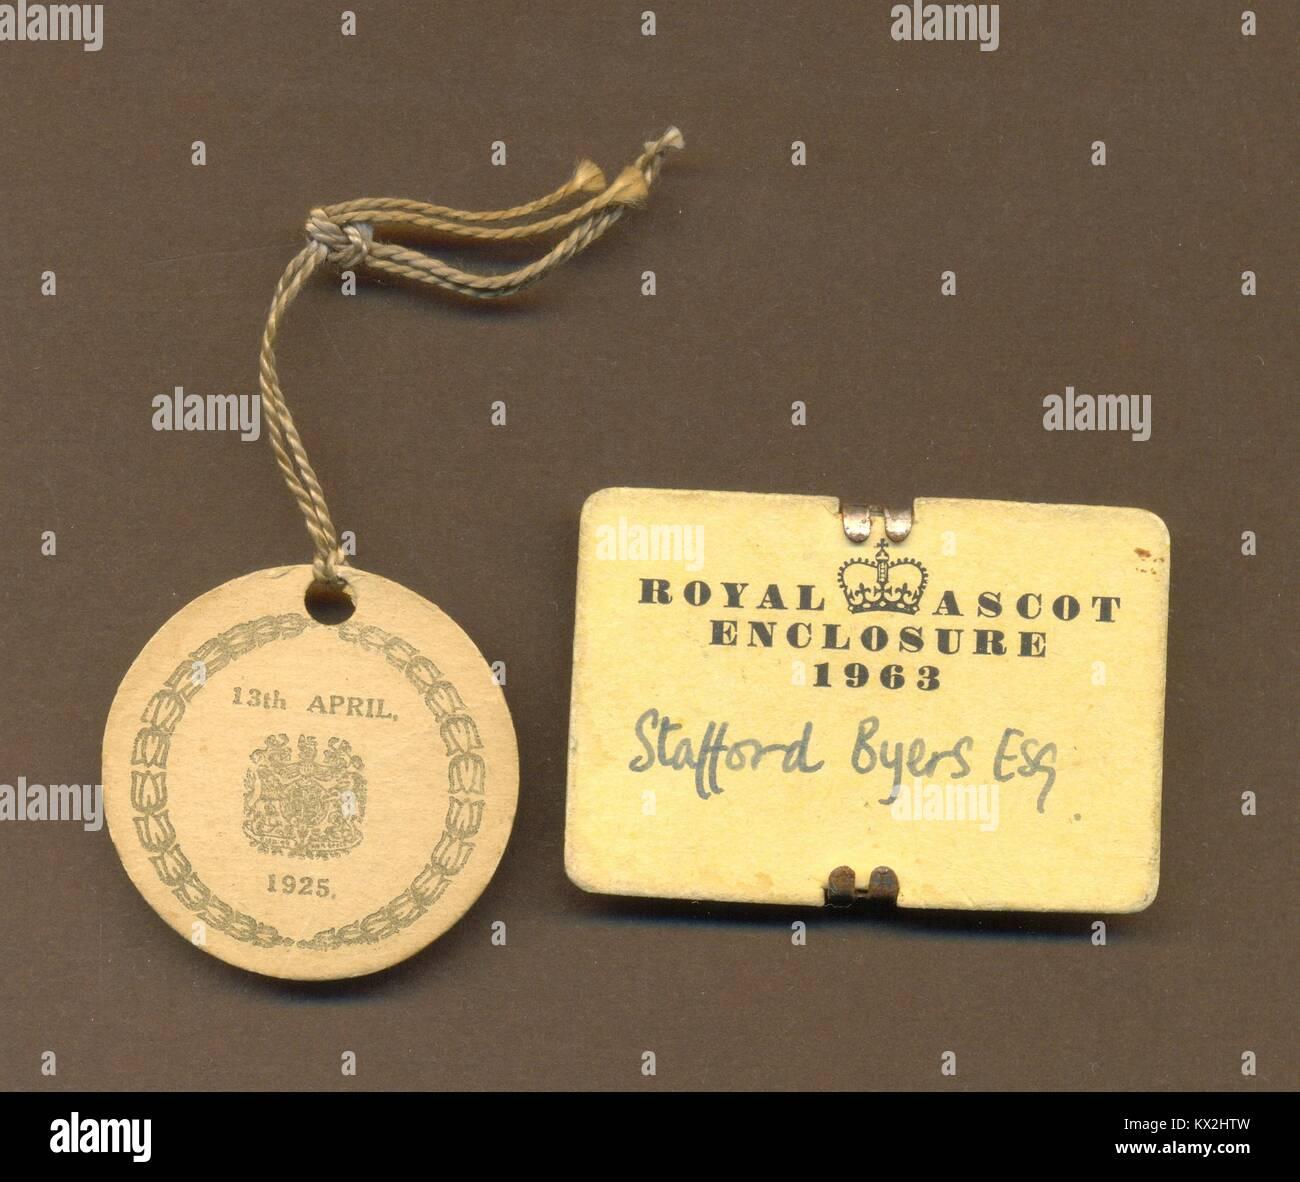 Badges for Royal Enclosure, Ascot - Stock Image